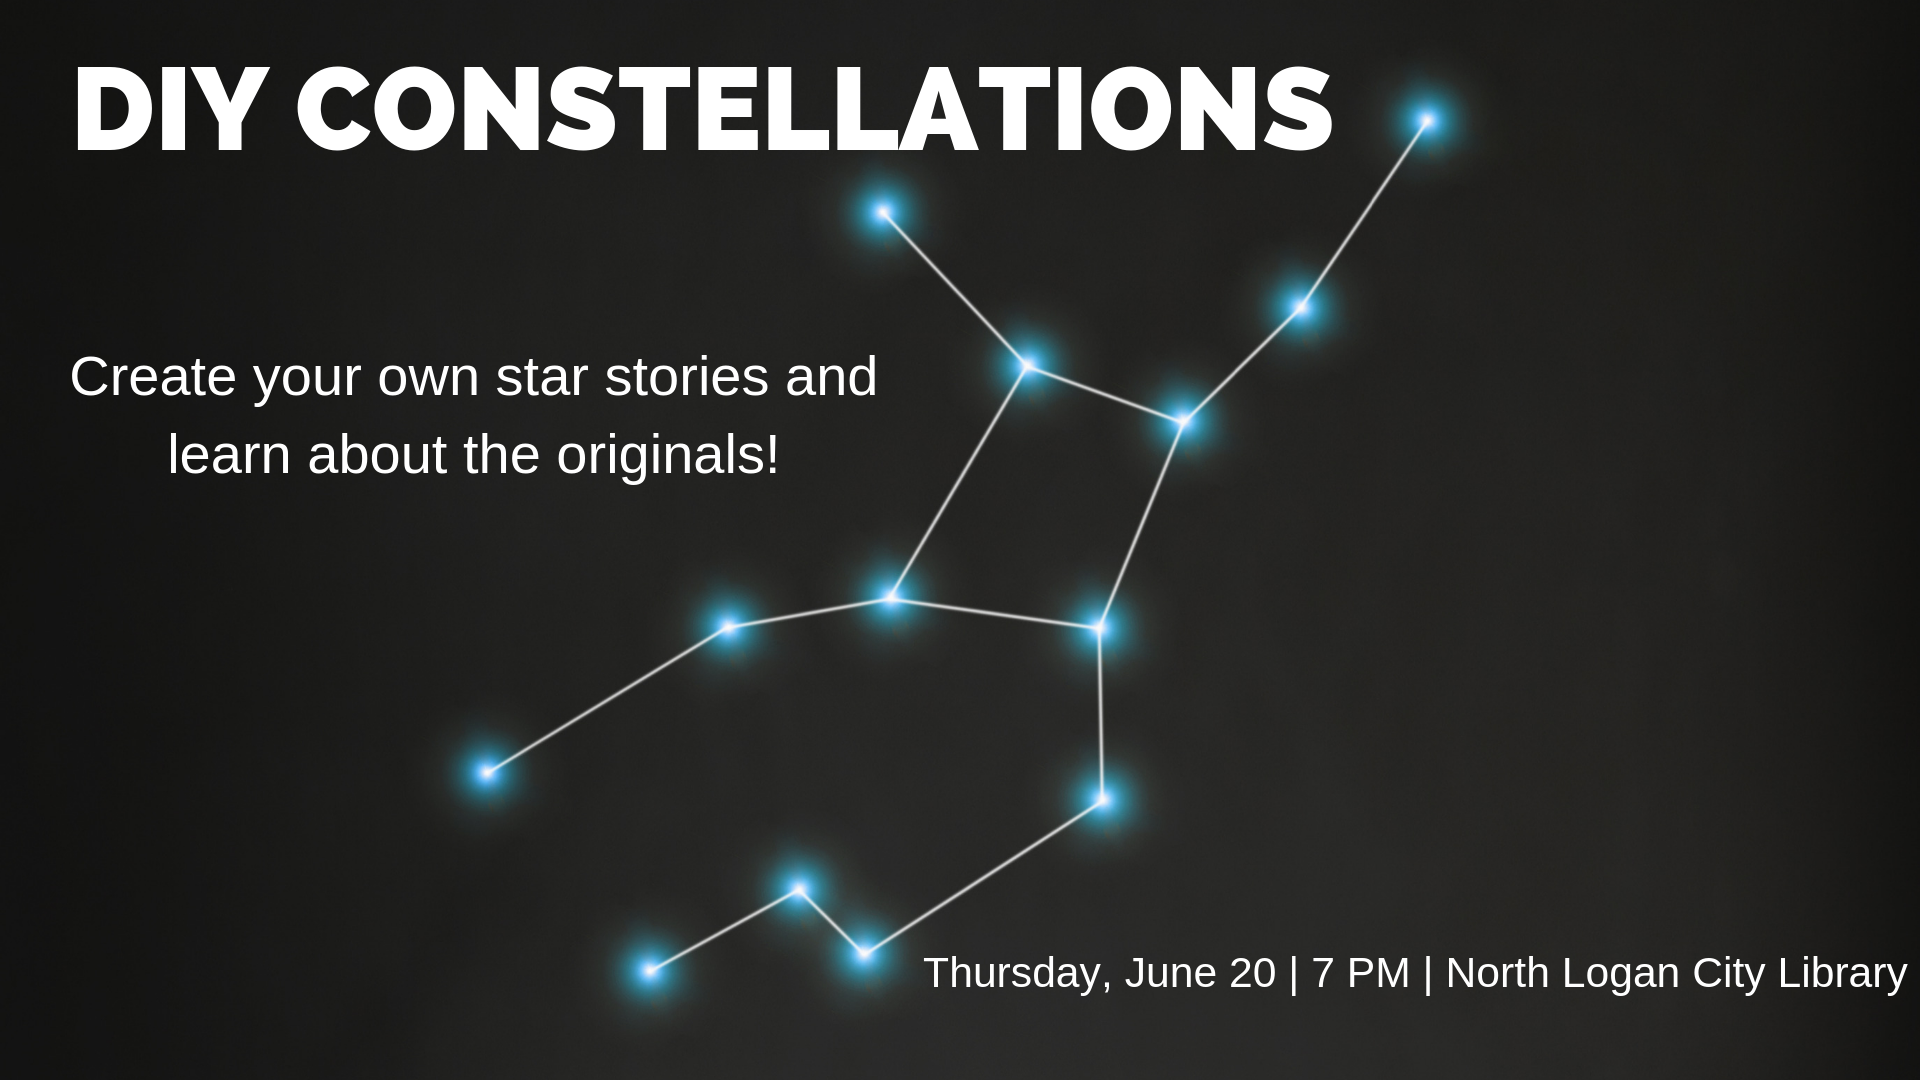 DIY Constellations